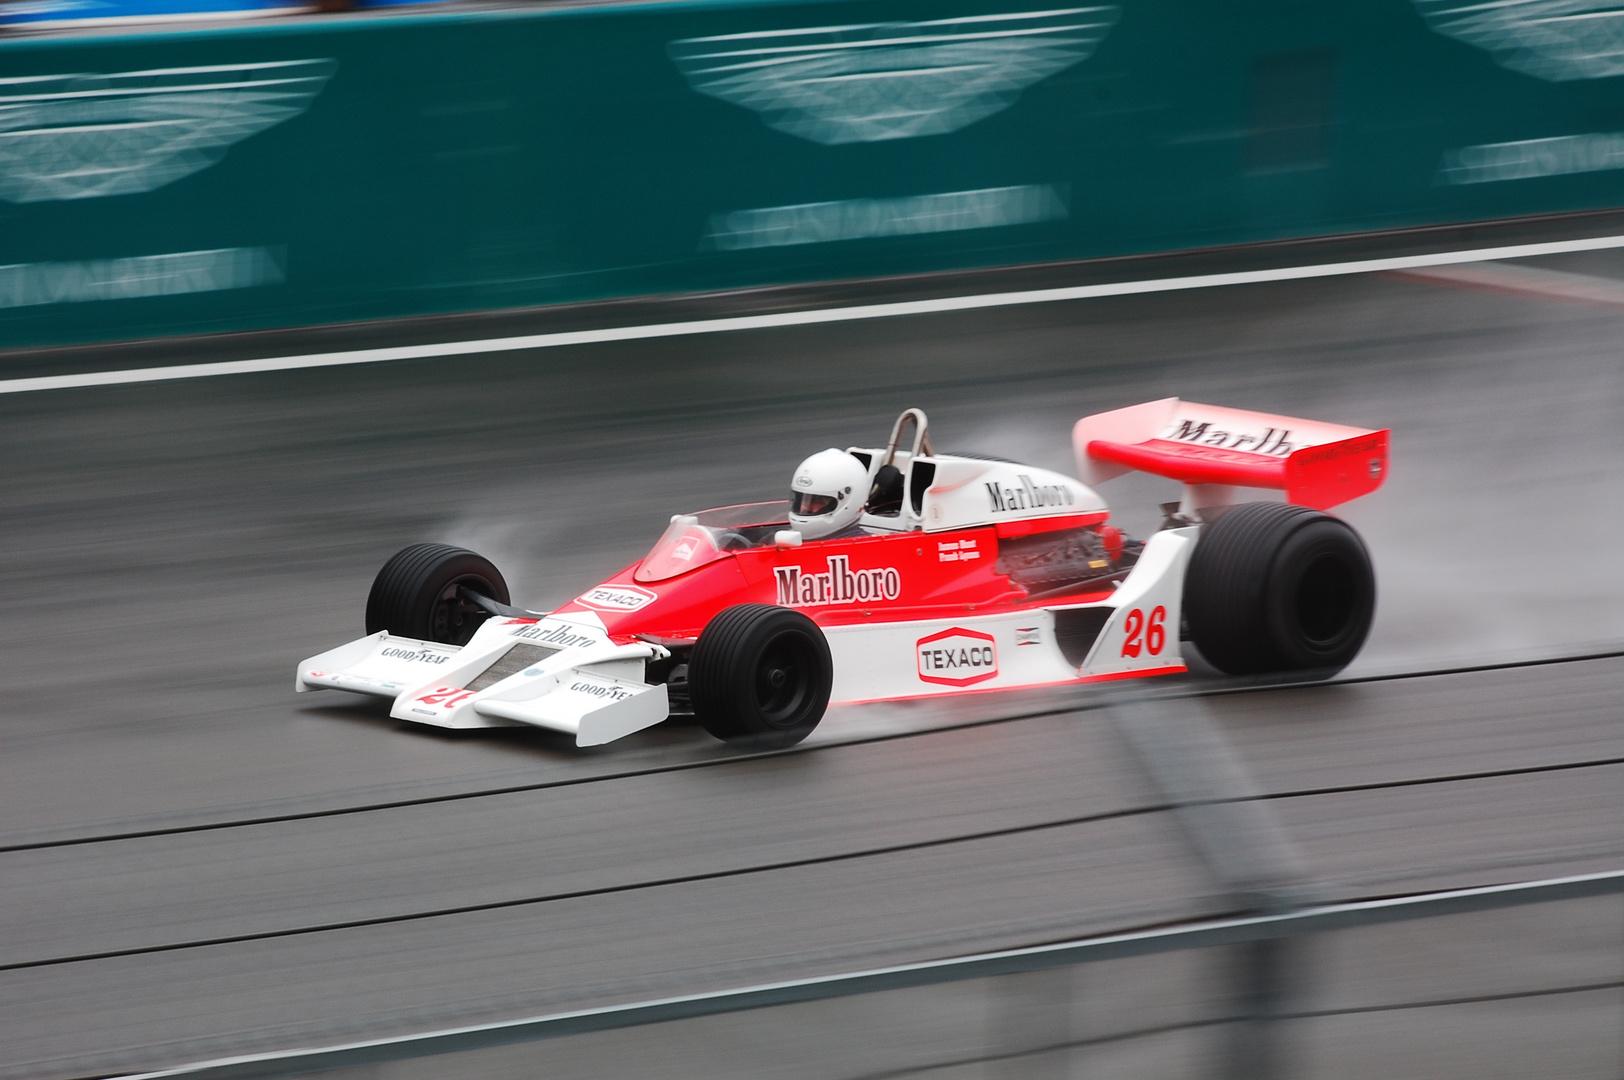 Formel 1 Classic 1 bis 1980